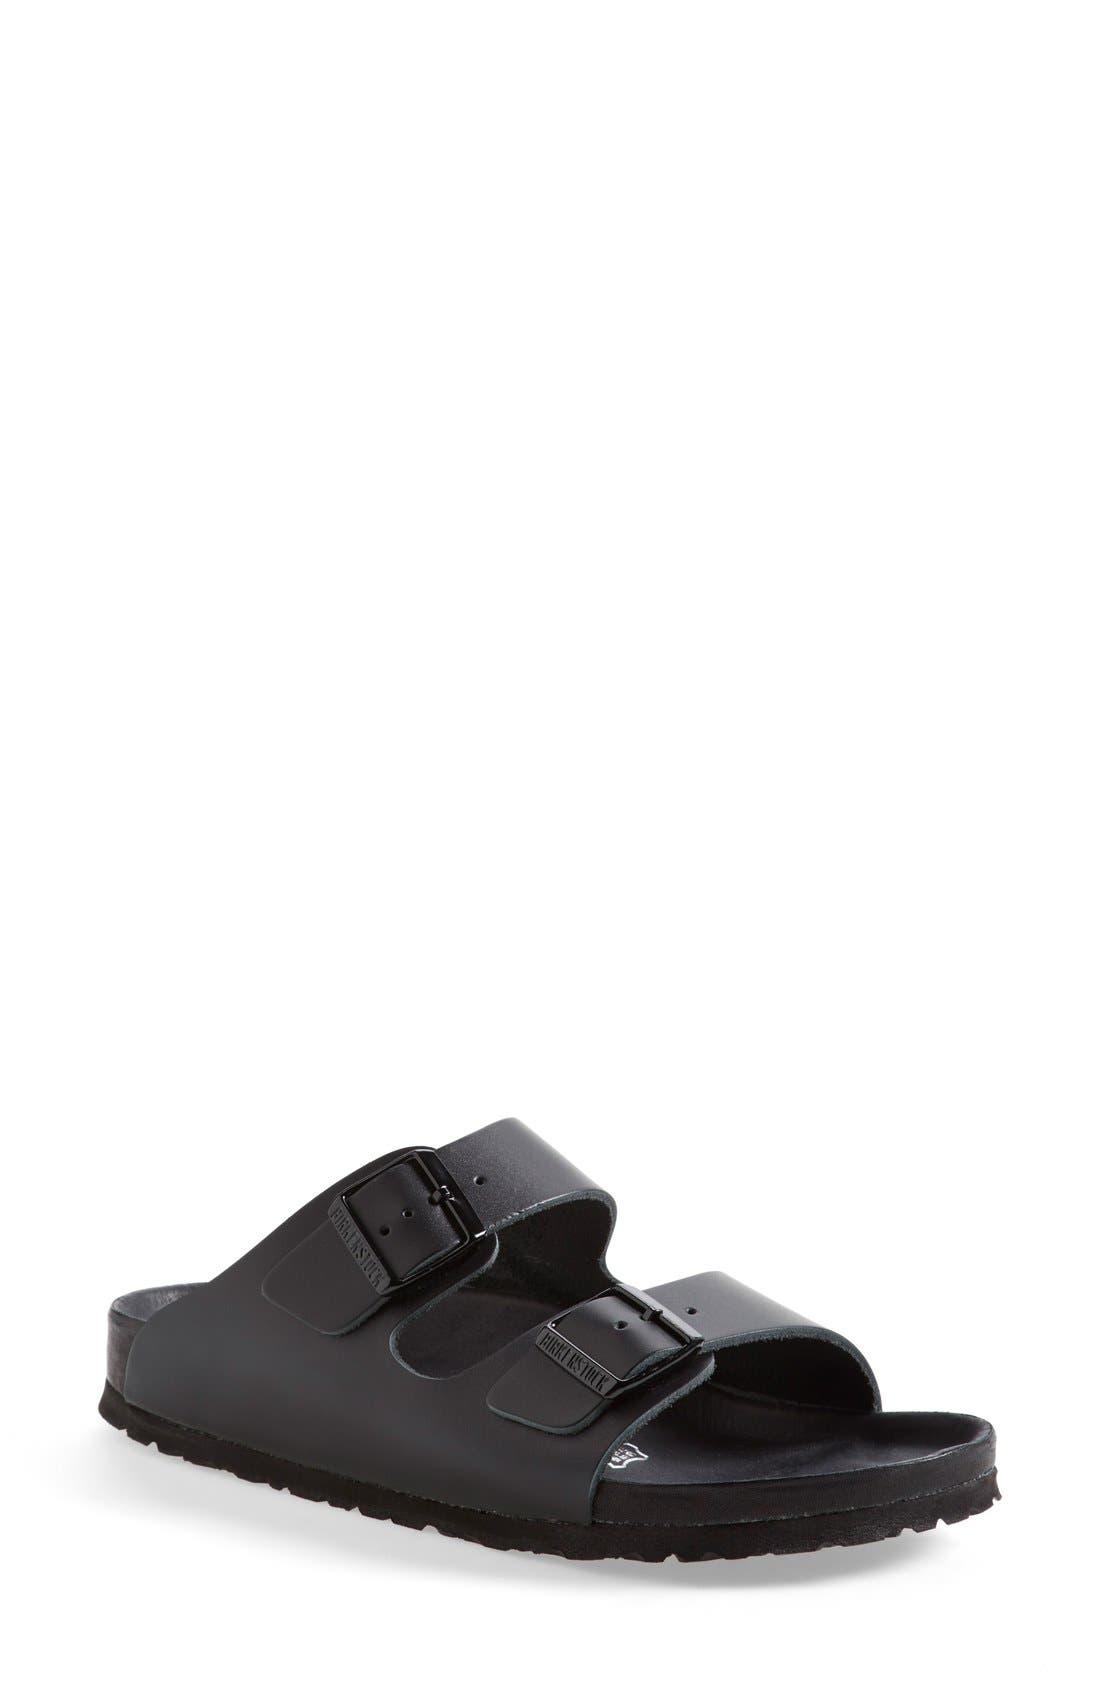 Alternate Image 1 Selected - Birkenstock 'Monterey' Leather Sandal